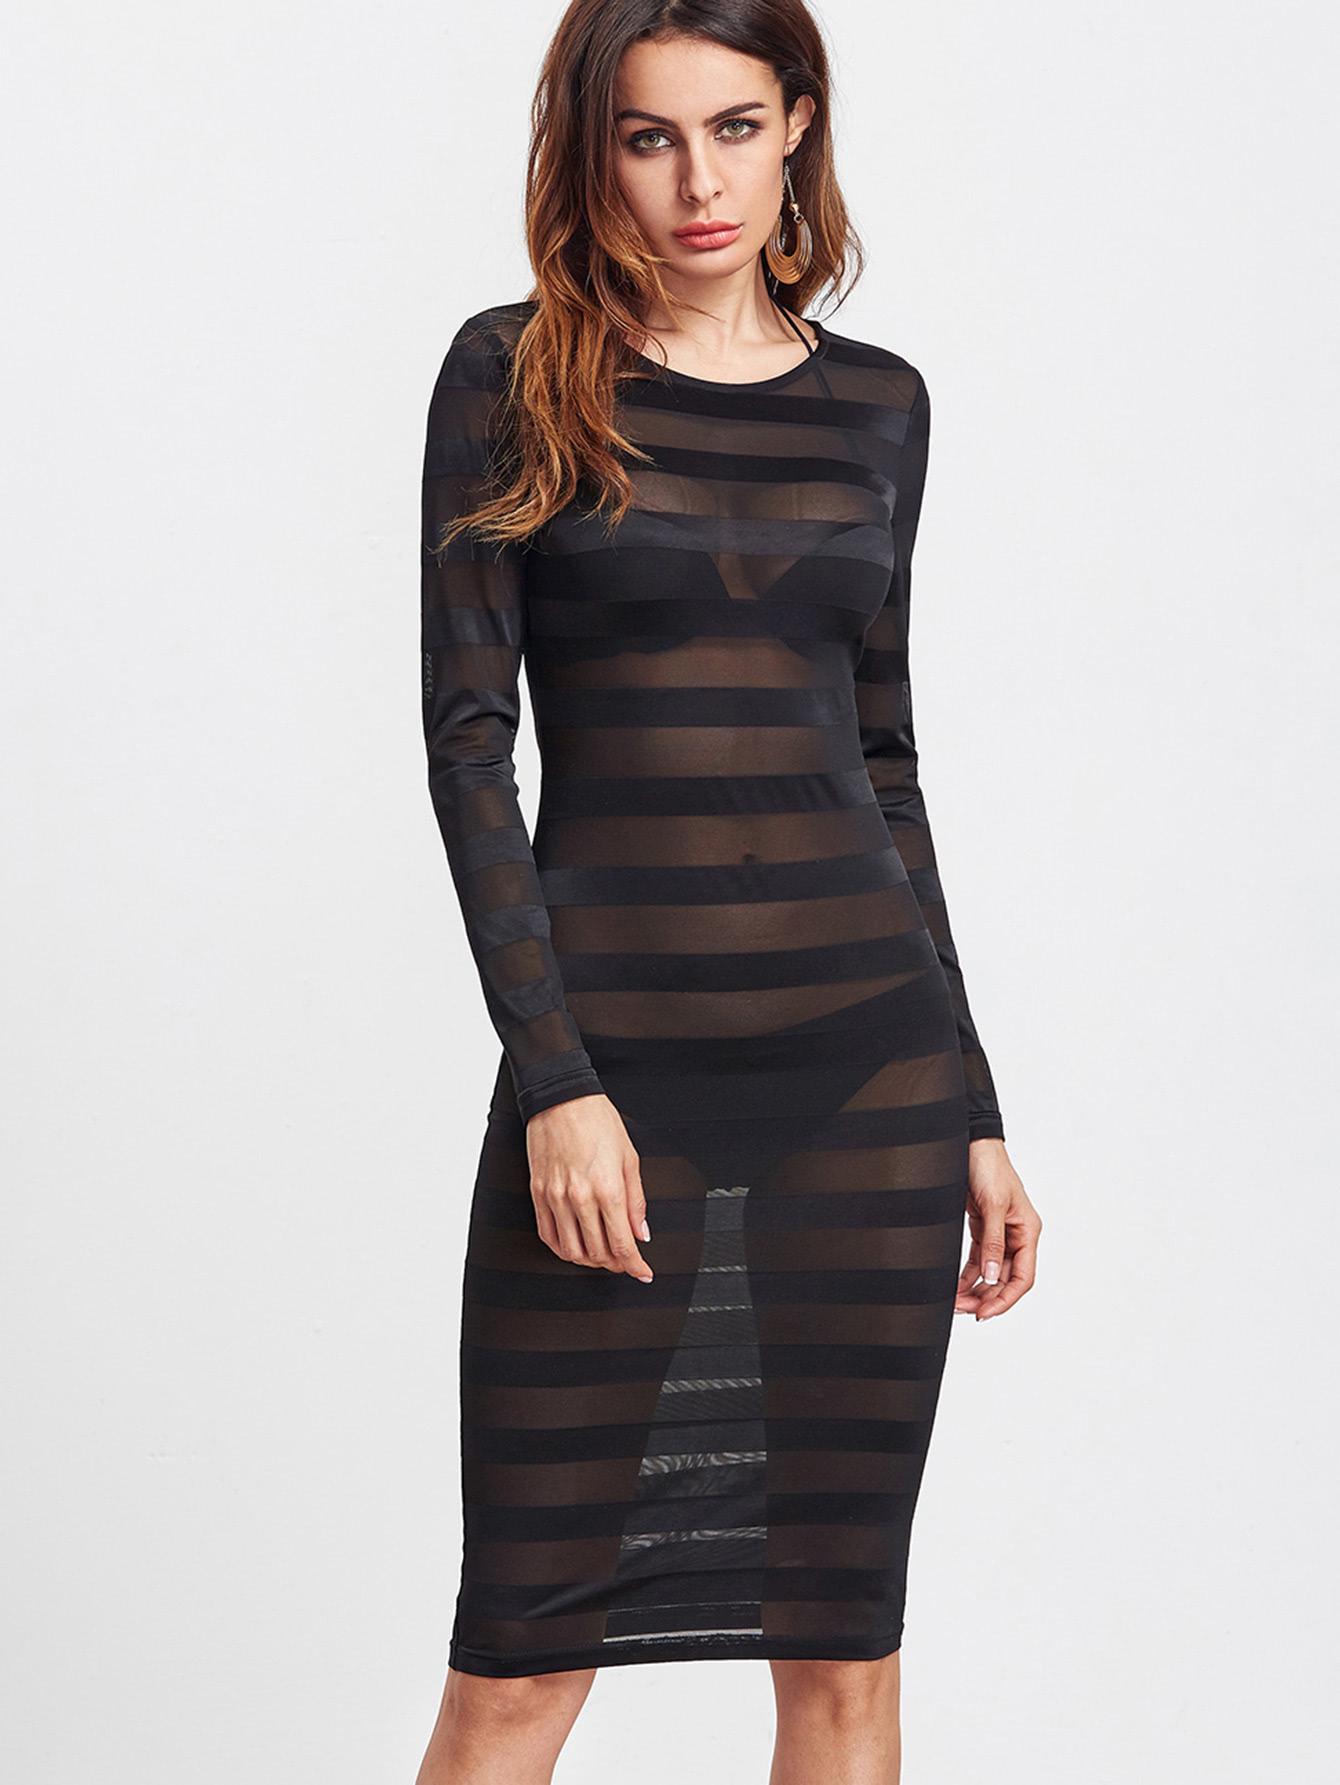 Wide Striped Mesh See-Through Dress dress161226705